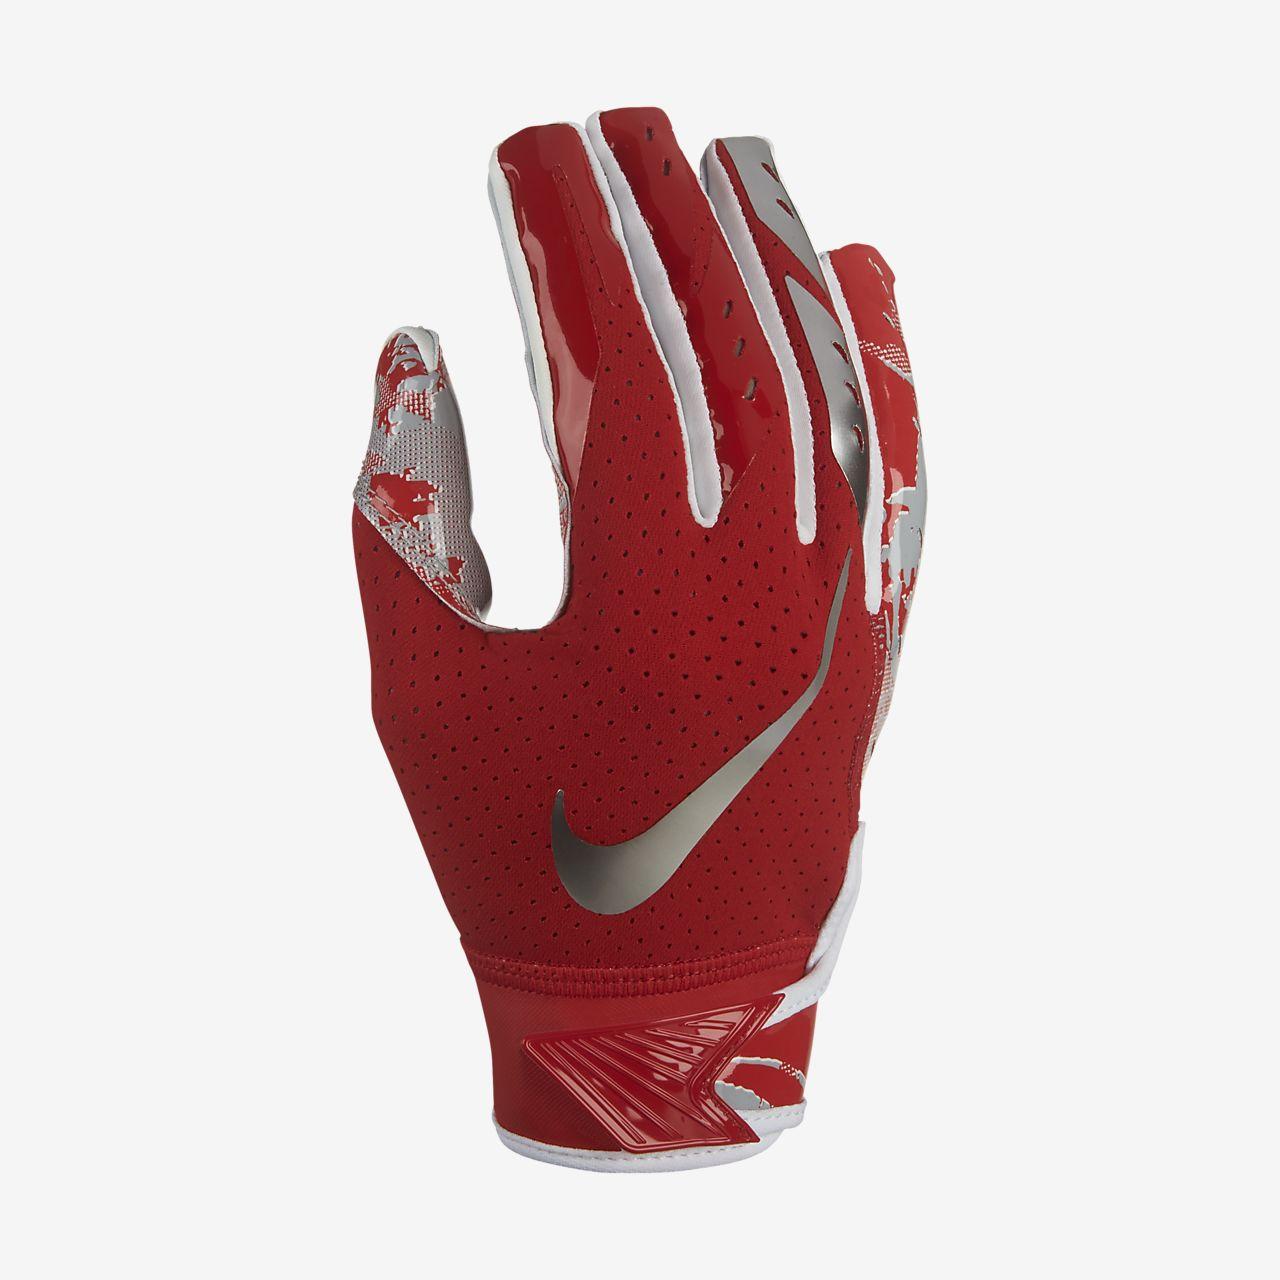 Nike Football Gloves Youth Size Chart: Nike Vapor Jet 5.0 Kids' Football Gloves. Nike.com